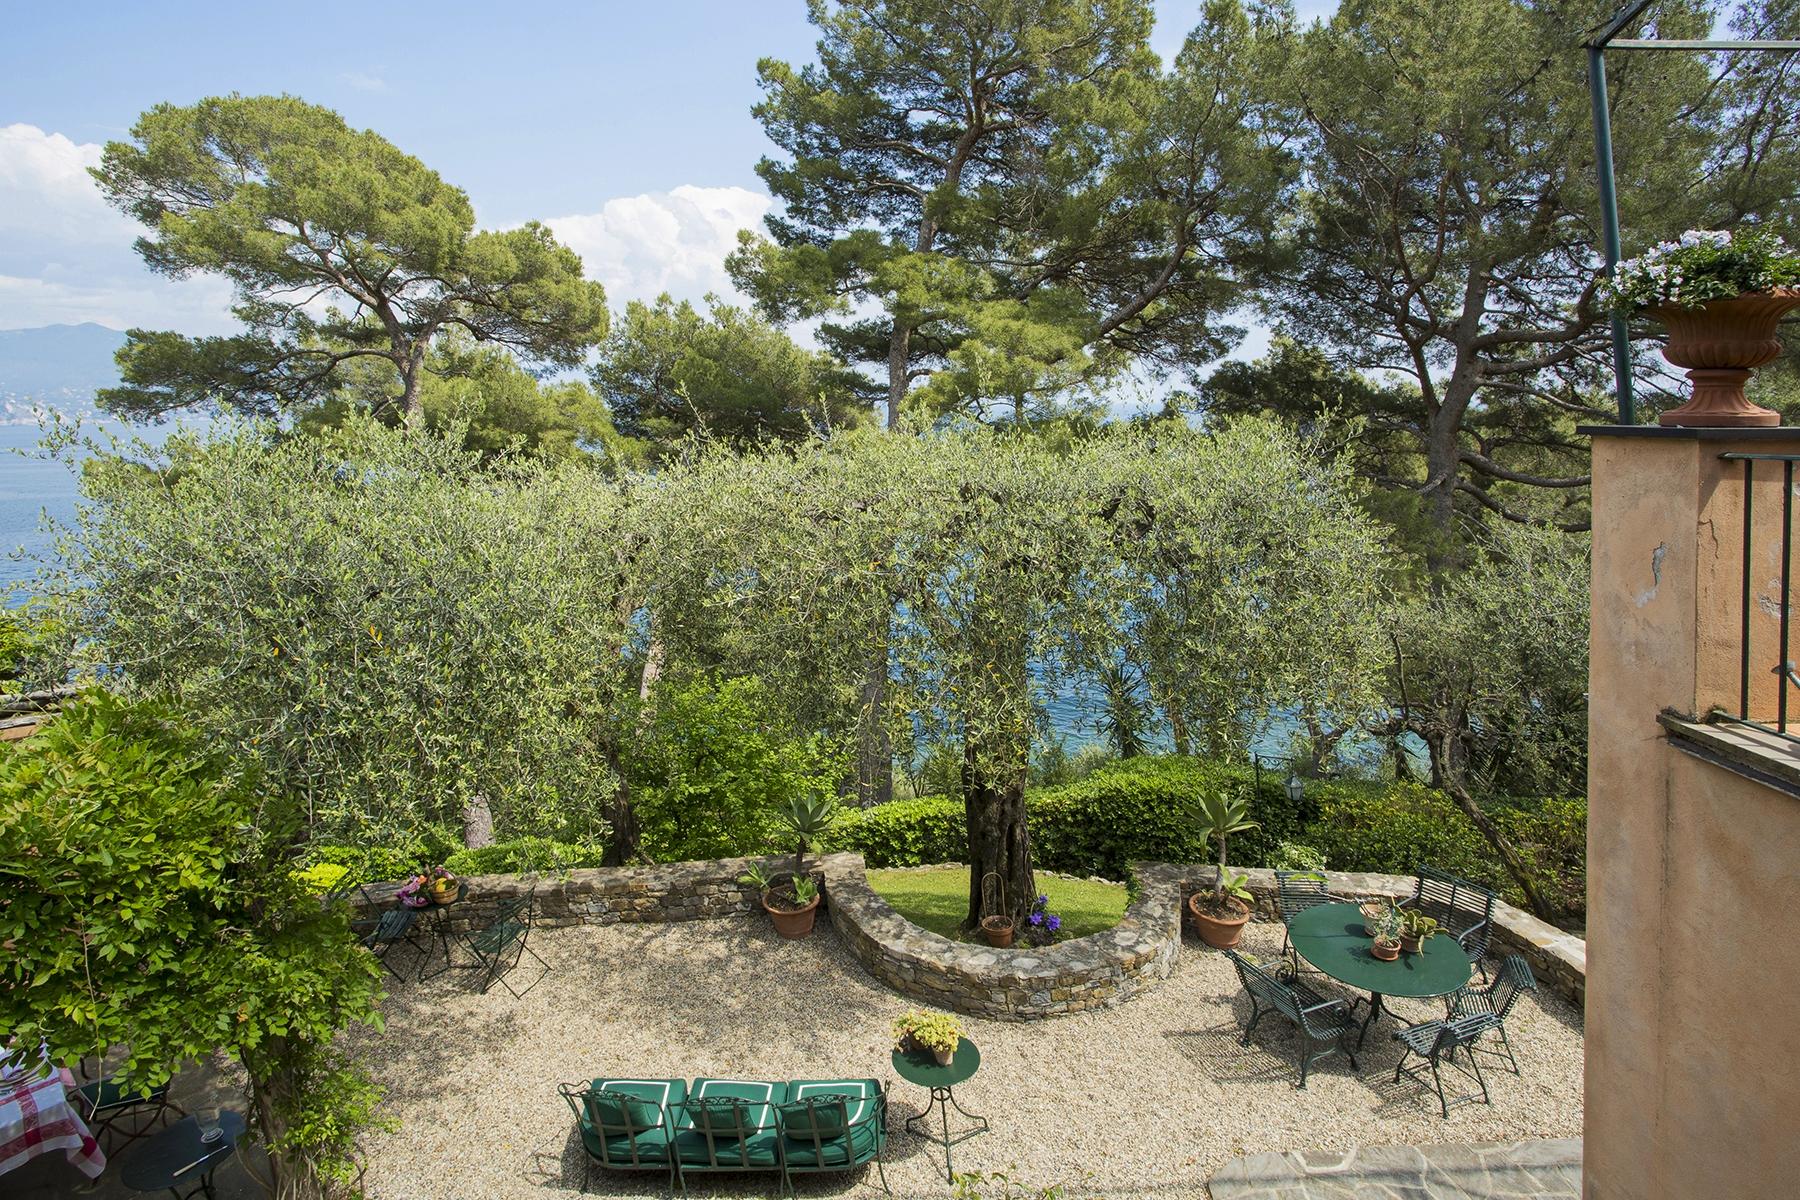 Villa in Vendita a Santa Margherita Ligure: 5 locali, 580 mq - Foto 30